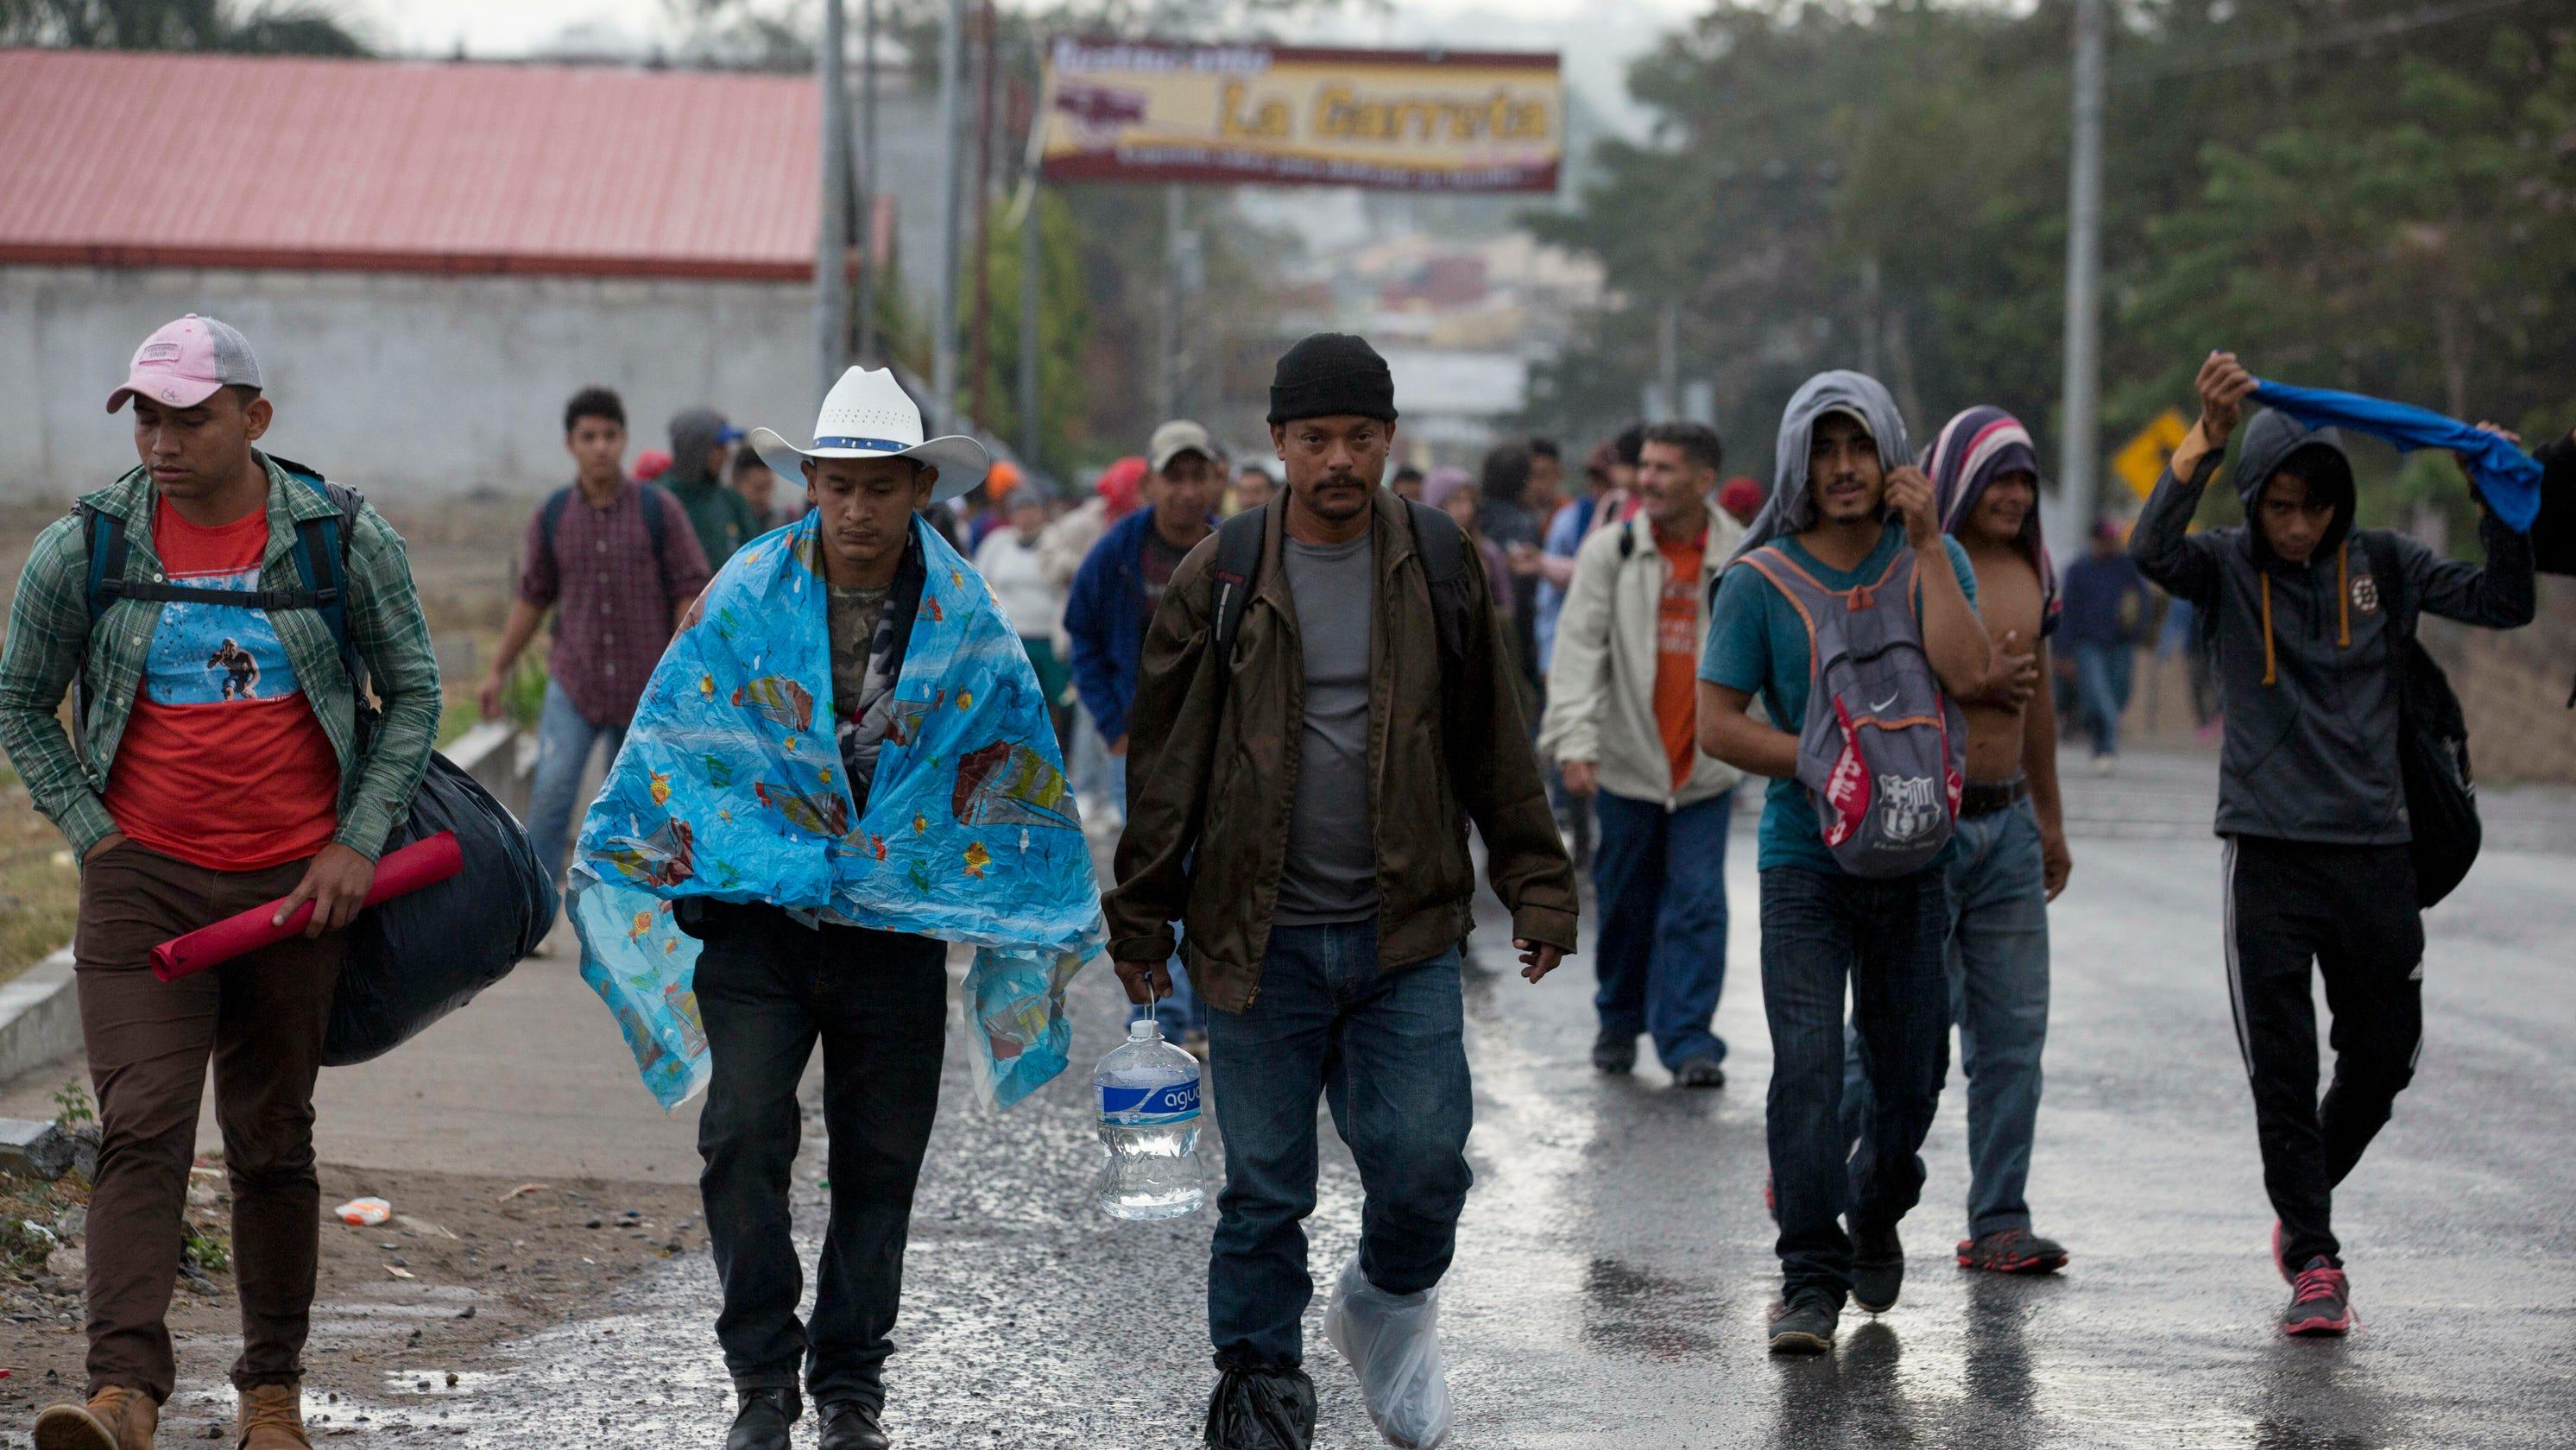 Why do migrant caravans start in Honduras?